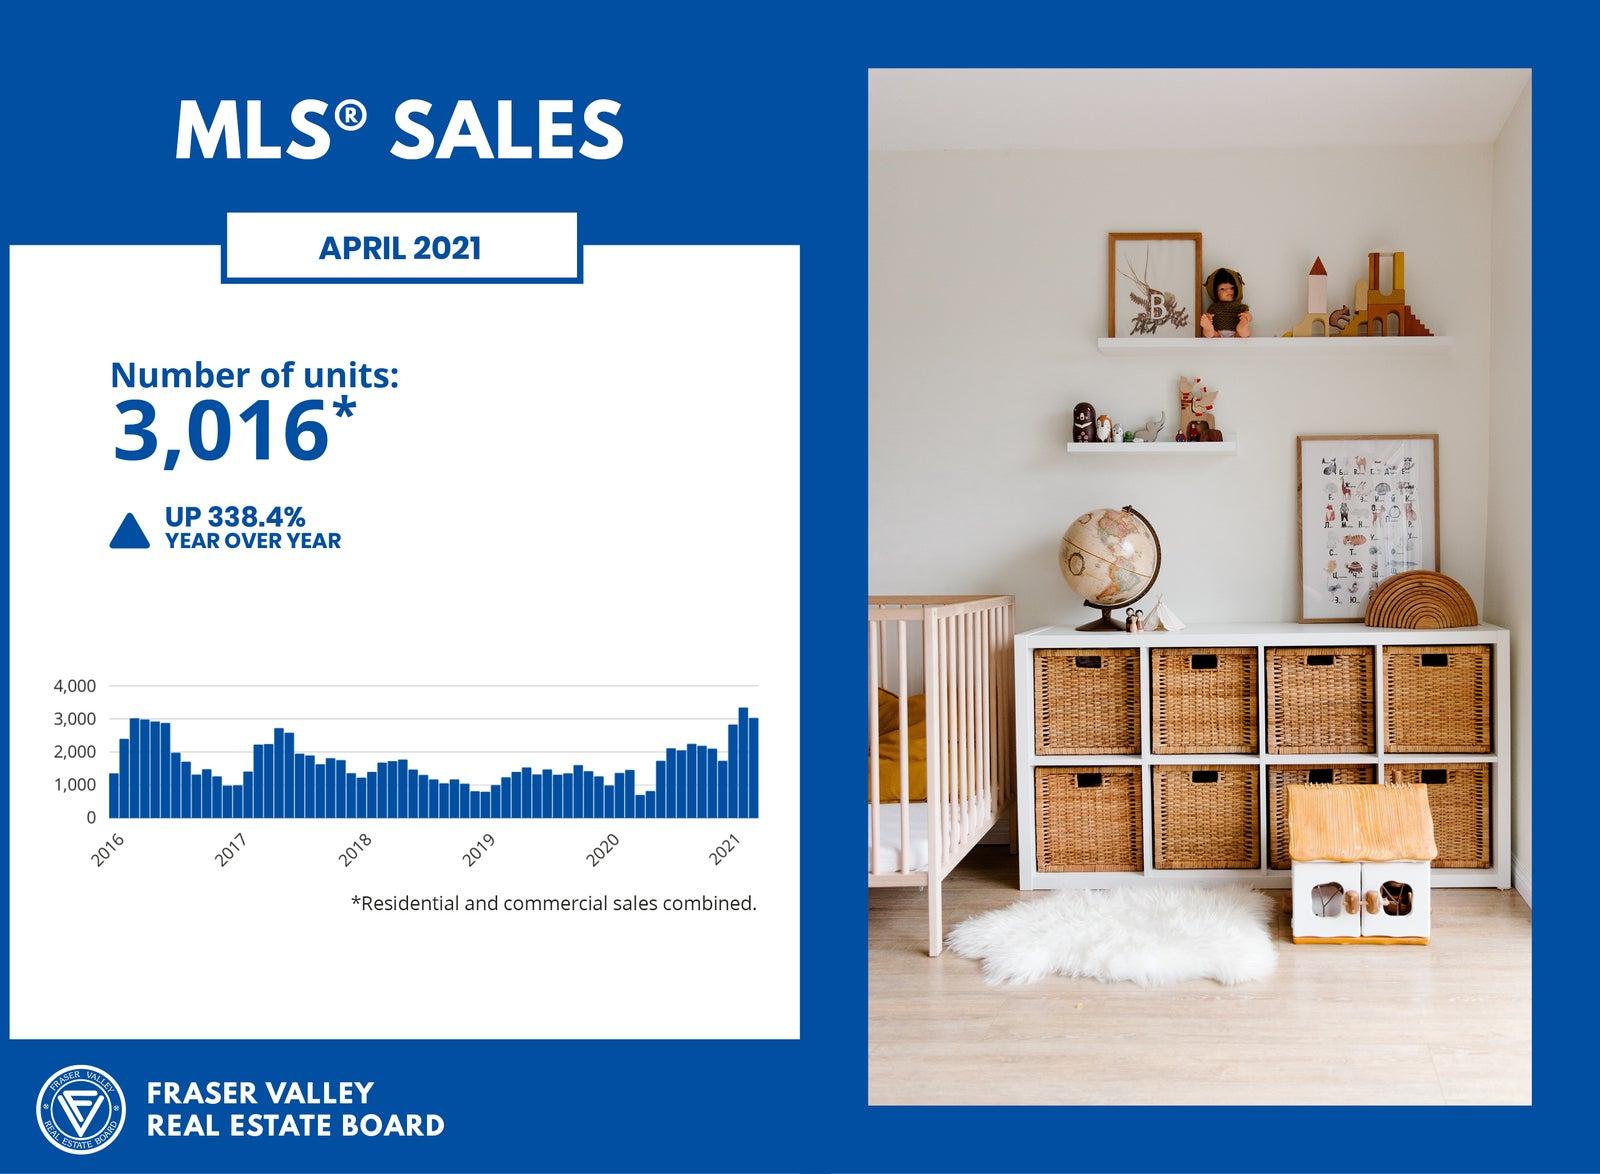 FVREB Housing Market - MLS Sales April 2021